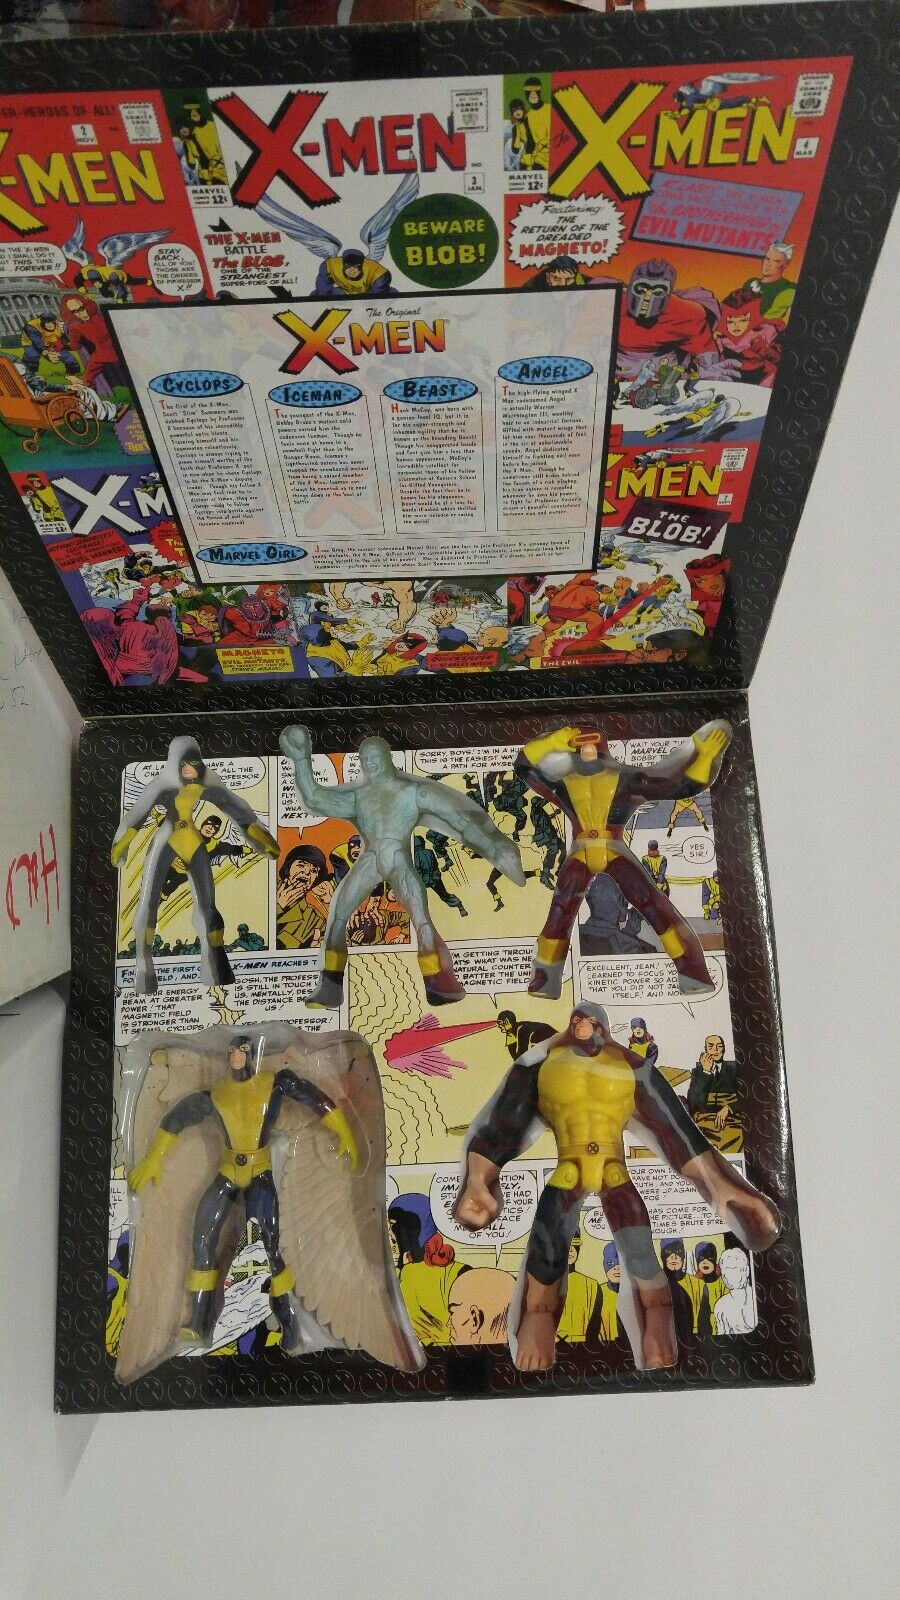 1997 The Original X-Men - Marvel Collectors Editions - ToyBiz - Marvel